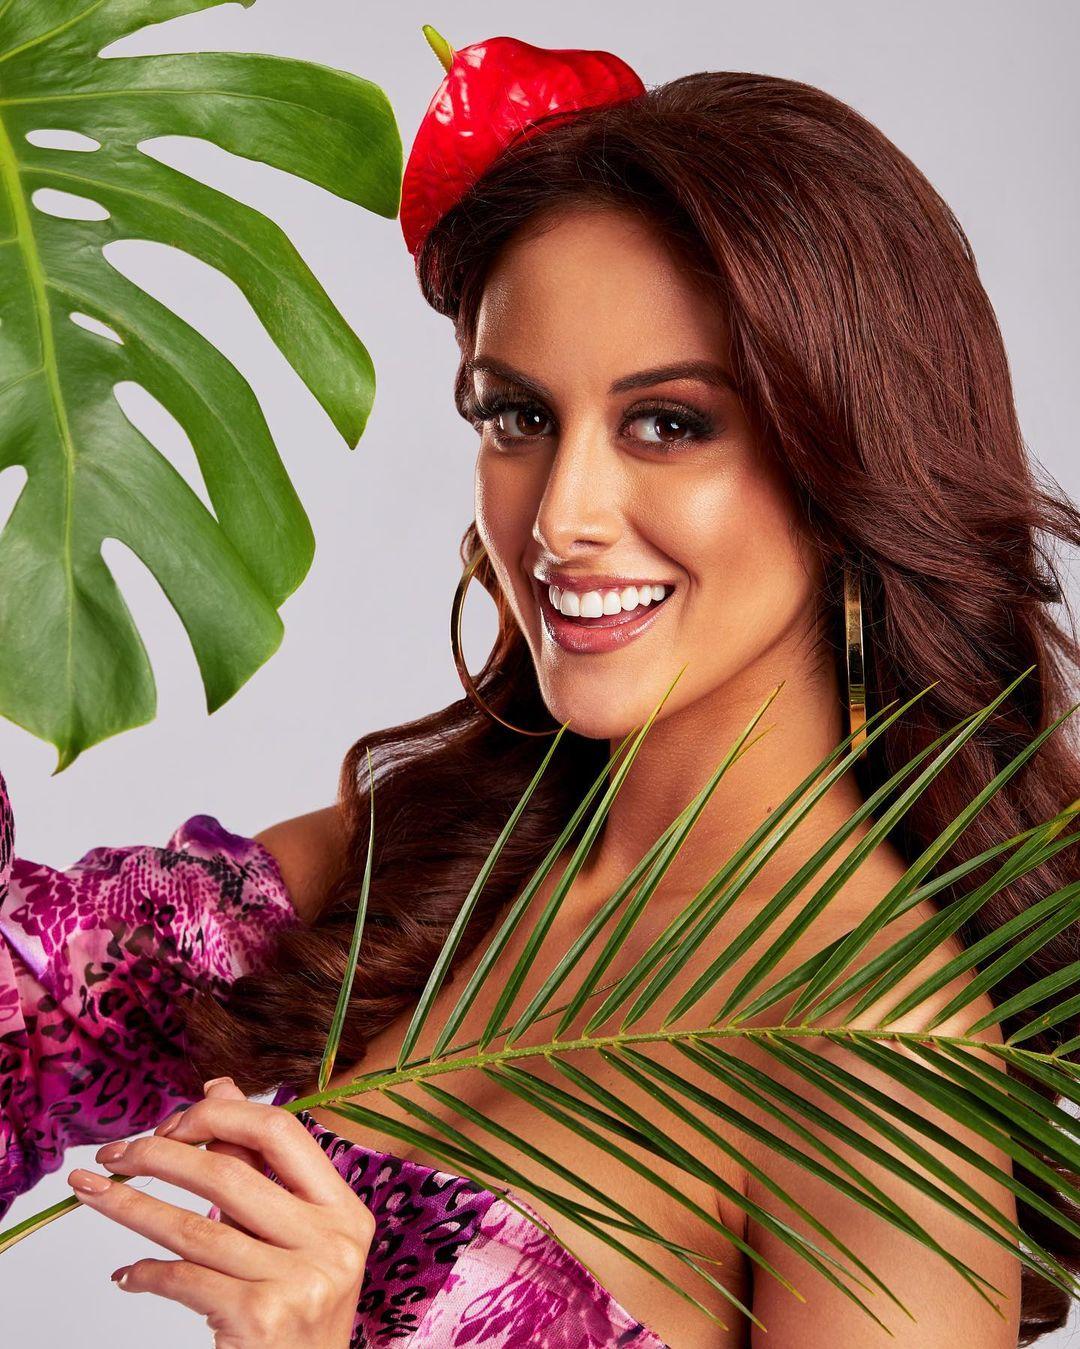 solange hermoza, finalista de miss teenager 2014, miss la liberta peru 2020. - Página 2 Misspe14